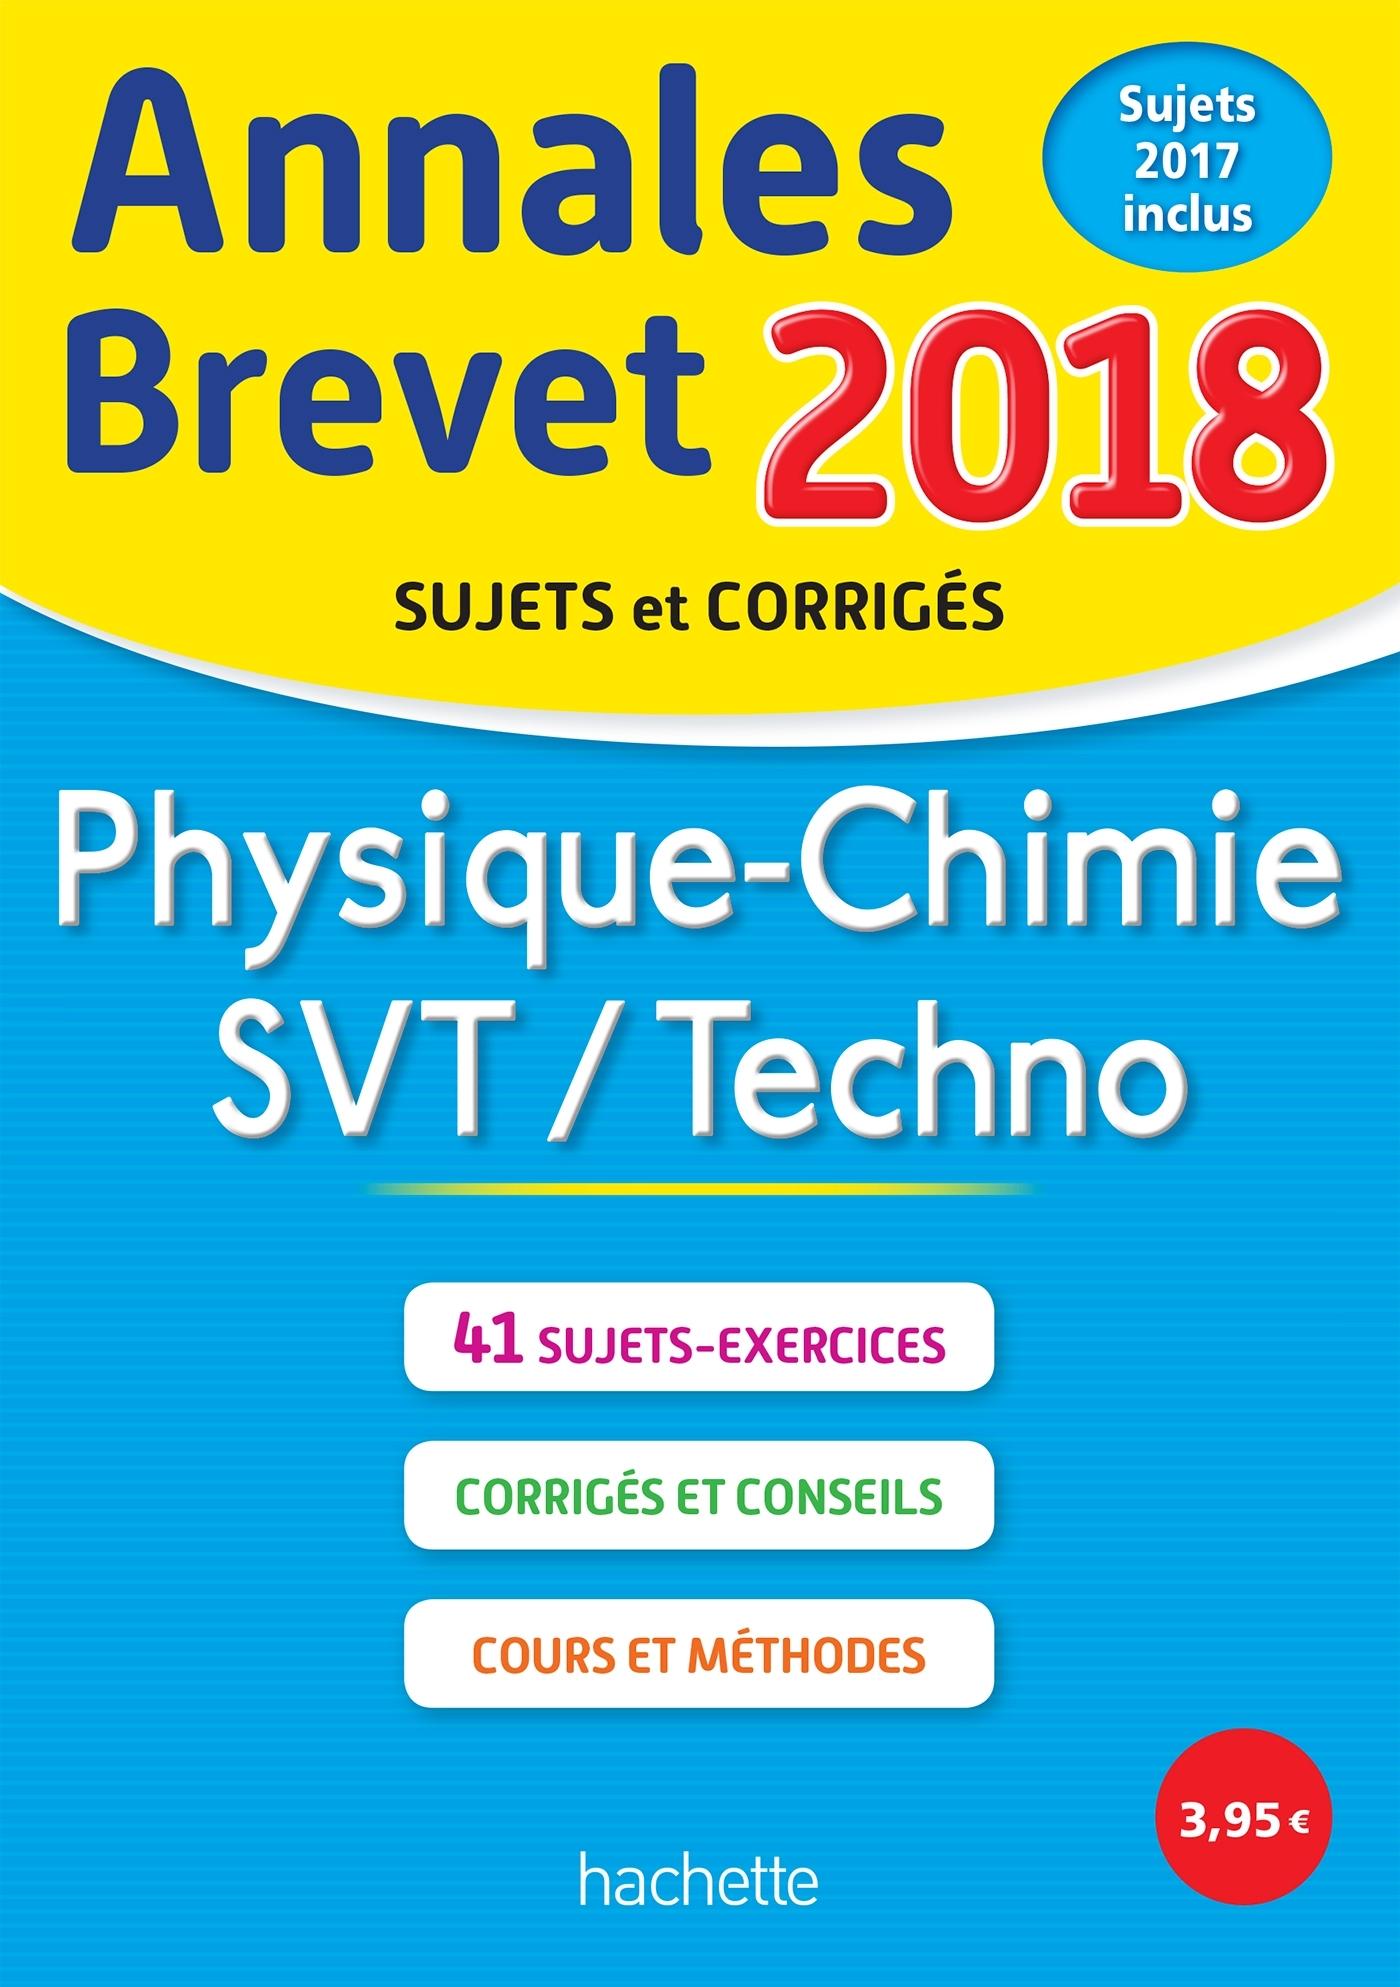 ANNALES BREVET 2018 PHYSIQUE-CHIMIE-SVT